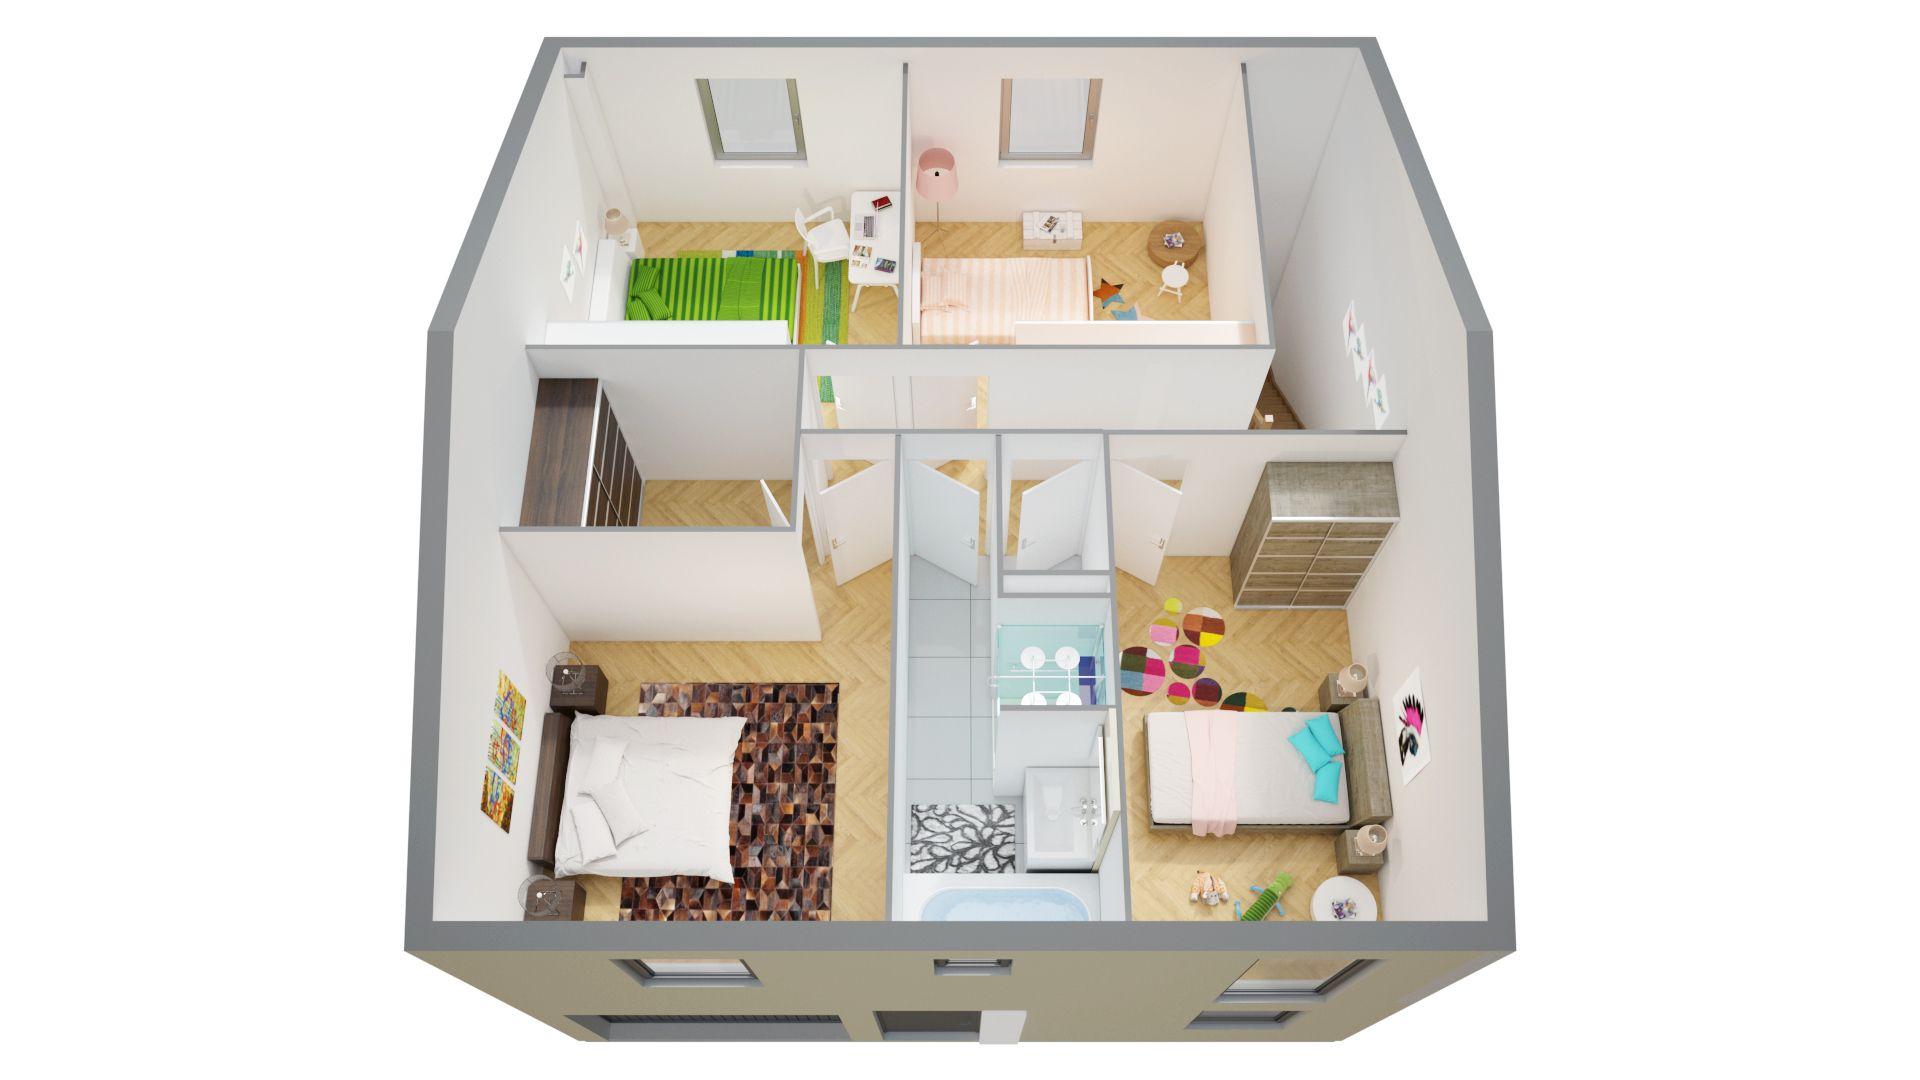 Maison A Etage Individuelle Maisons Phenix Maison Phenix Plan Maison Plan Maison 3 Chambres